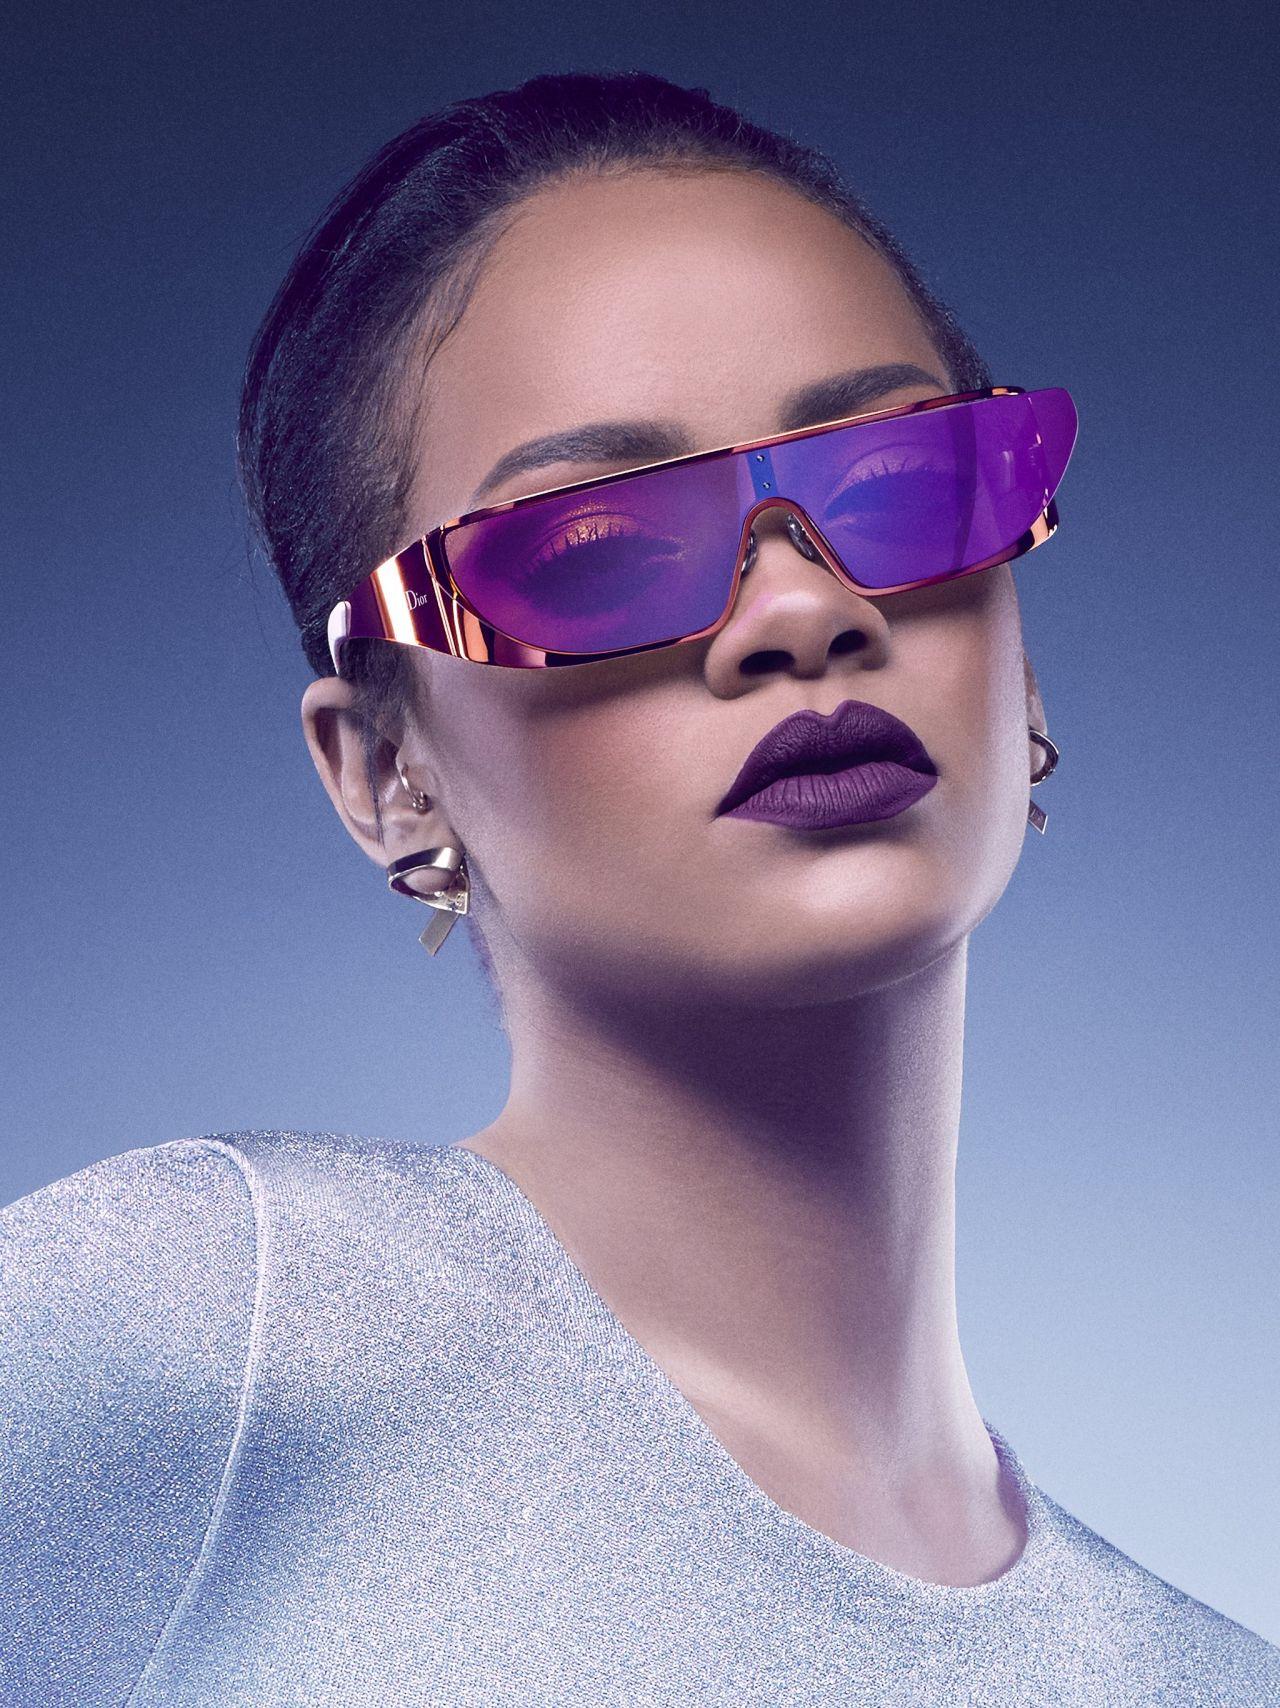 Rihanna - Photoshoot for Dior x Rihanna Eyewear May 2016 Rihanna 2016